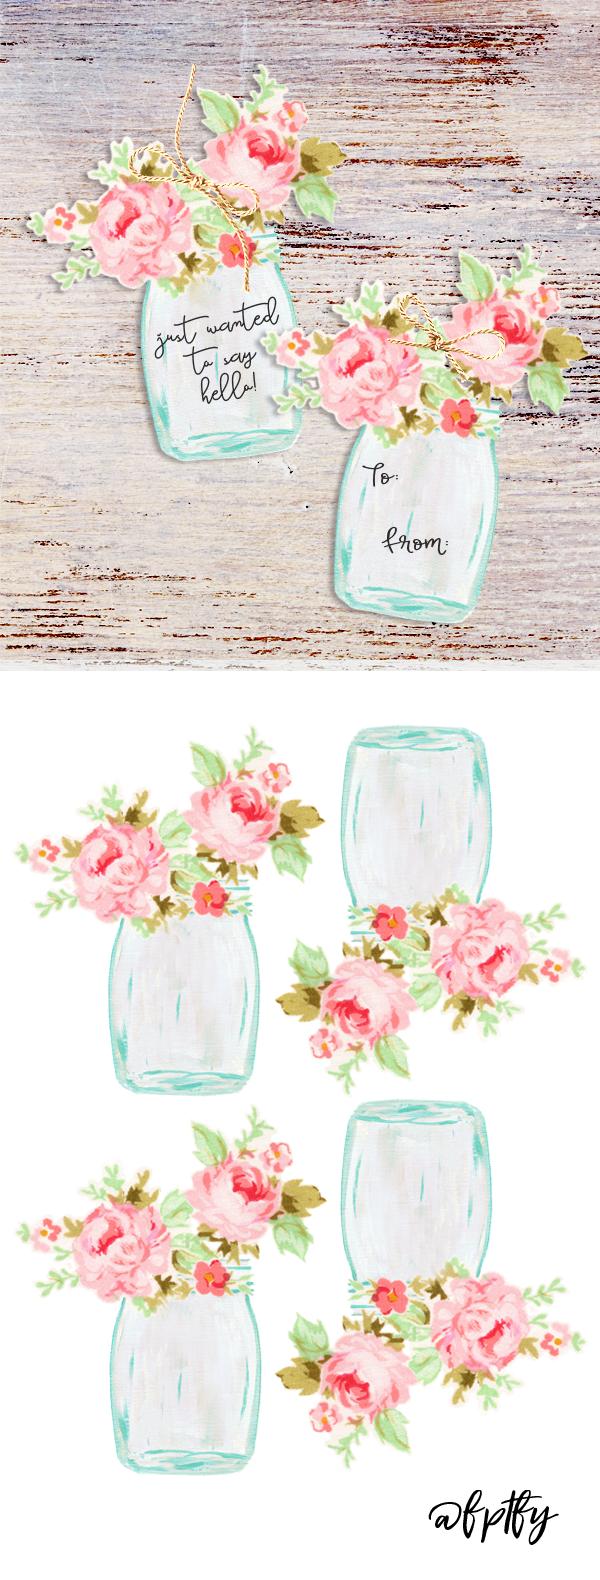 Free Mason Jar Floral Tags Pretty Mason Jar Crafts Mason Jars Gift Tags